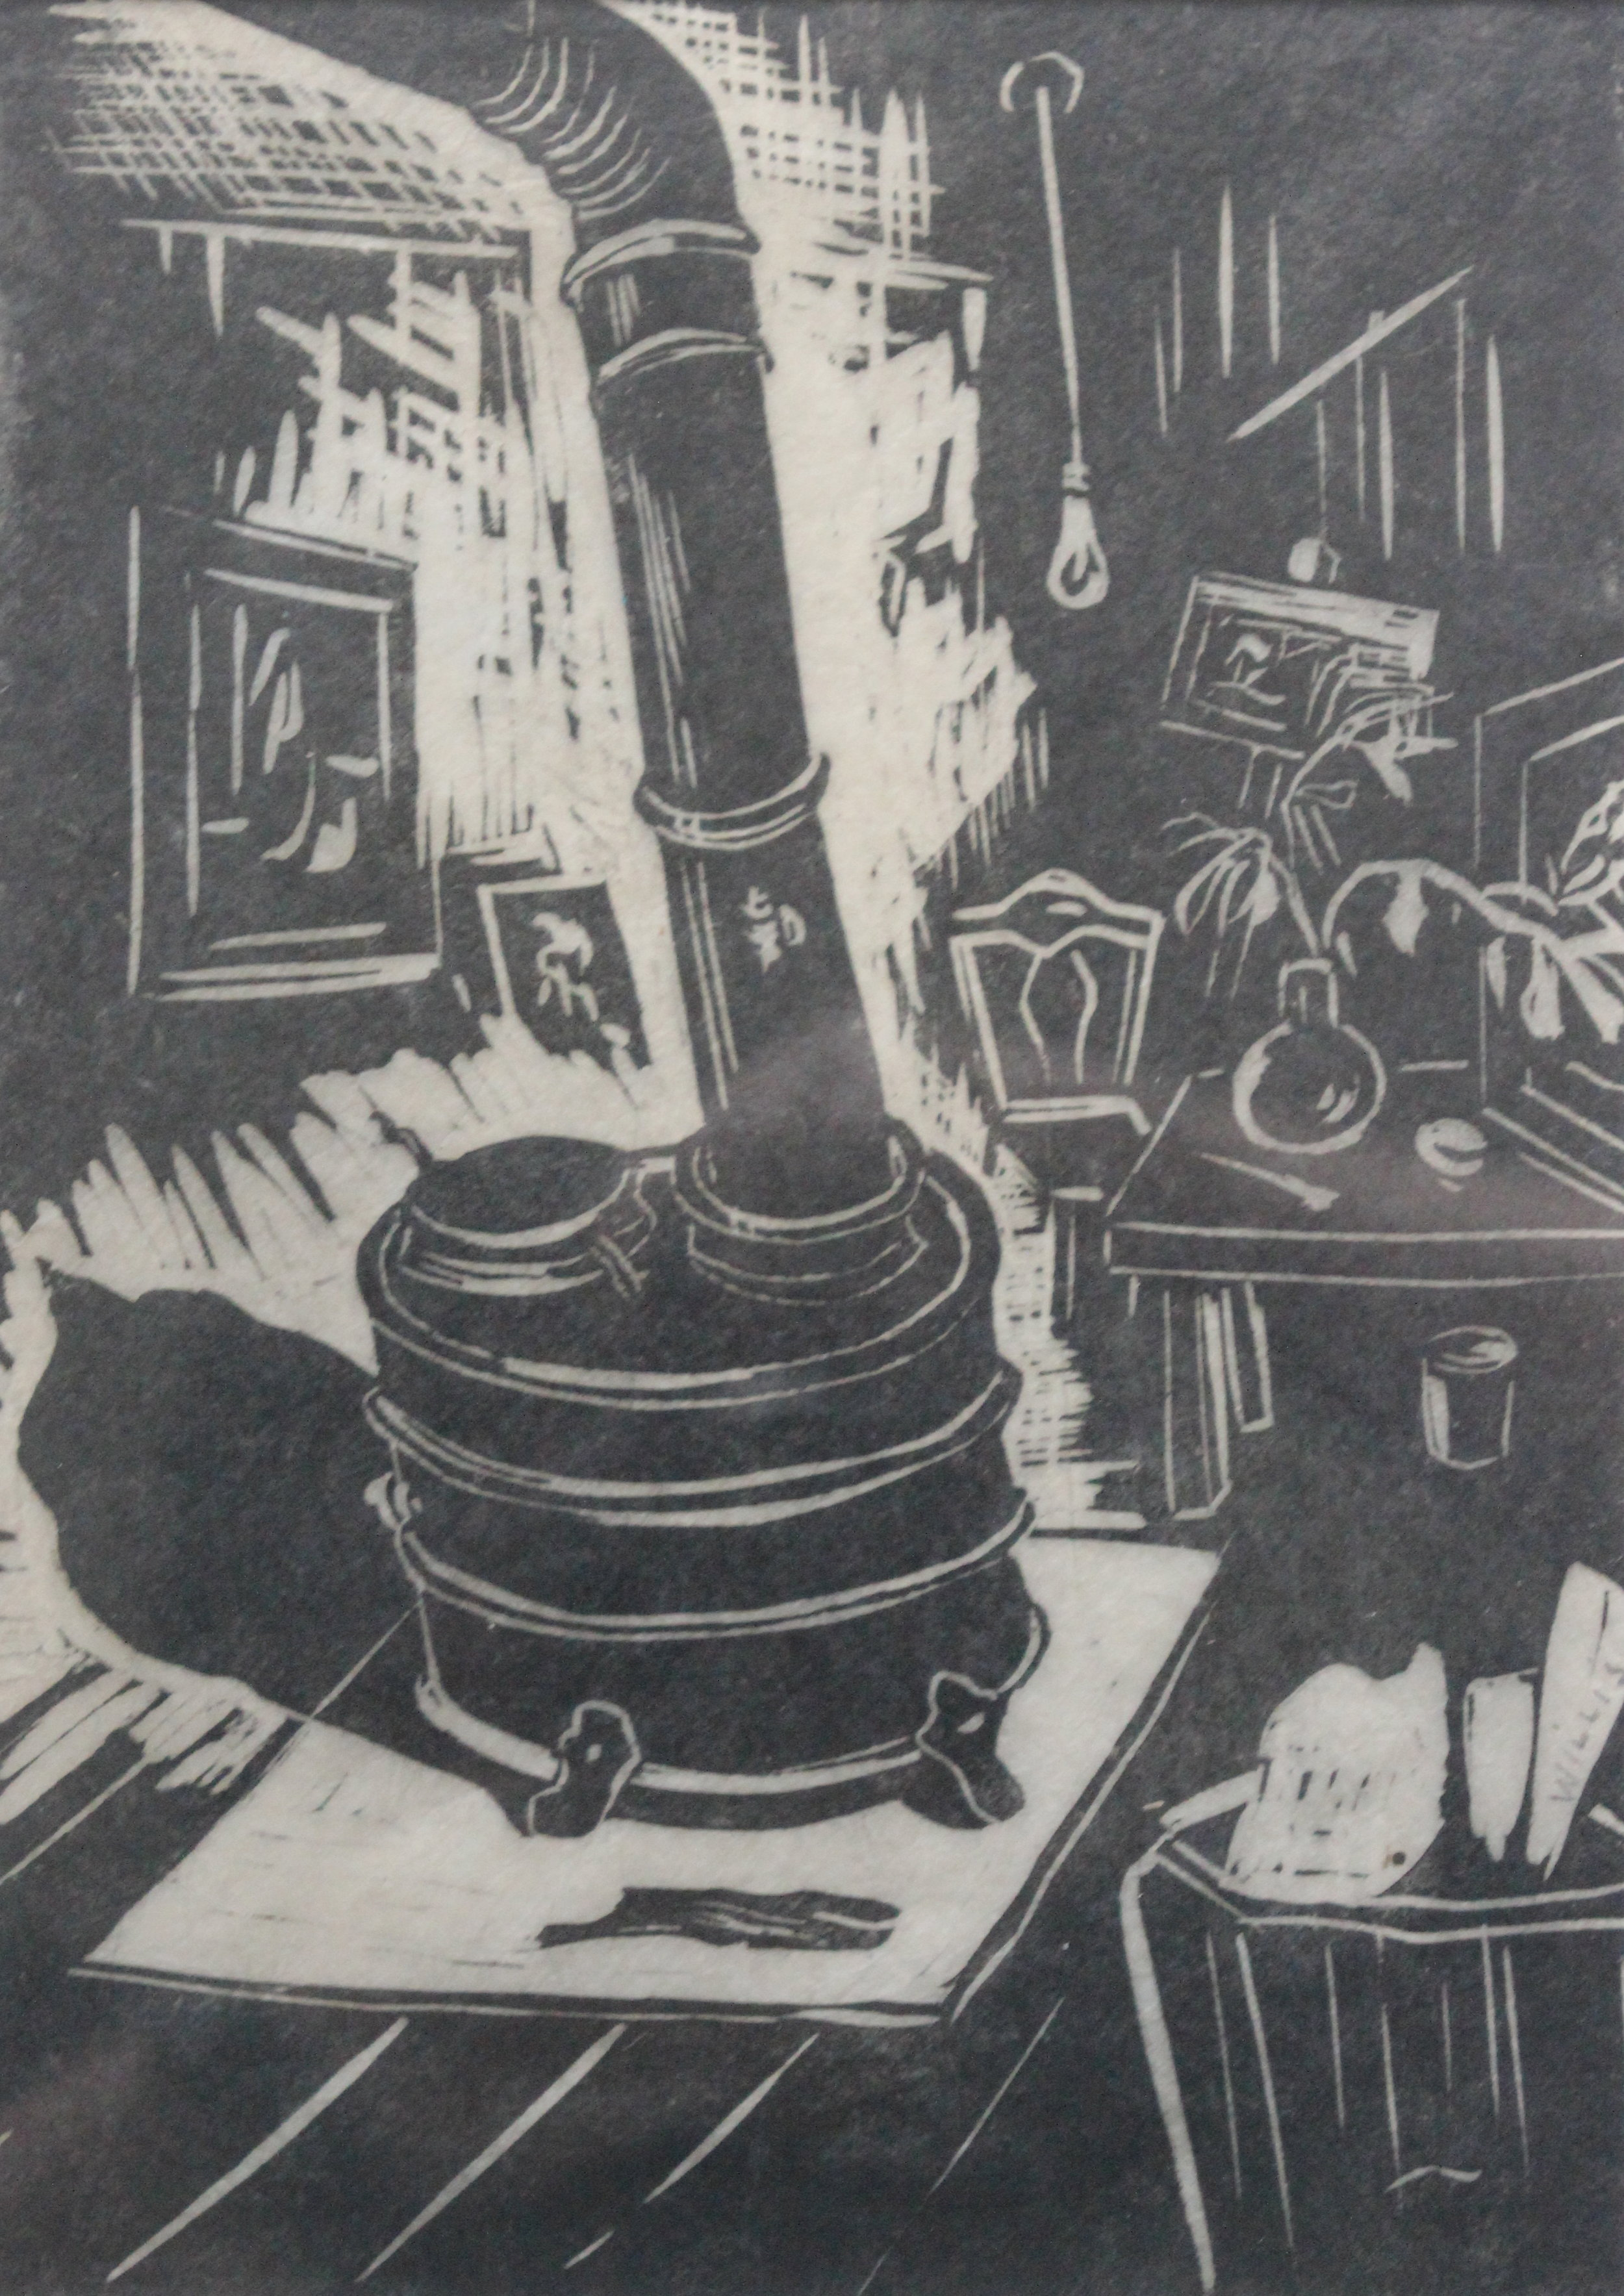 Dorothy Henzell-Willis, Stumpy, the Studio Stove, 1950